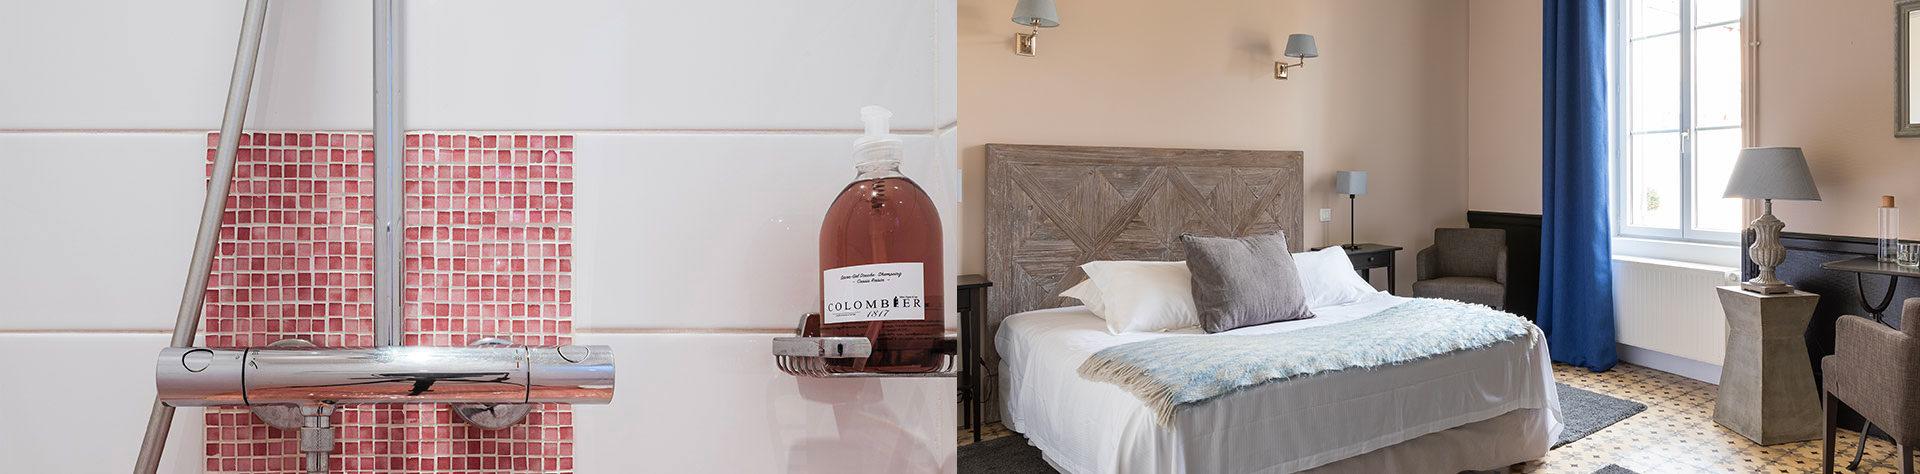 Chambres traditions Hôtel Clos du Colombier